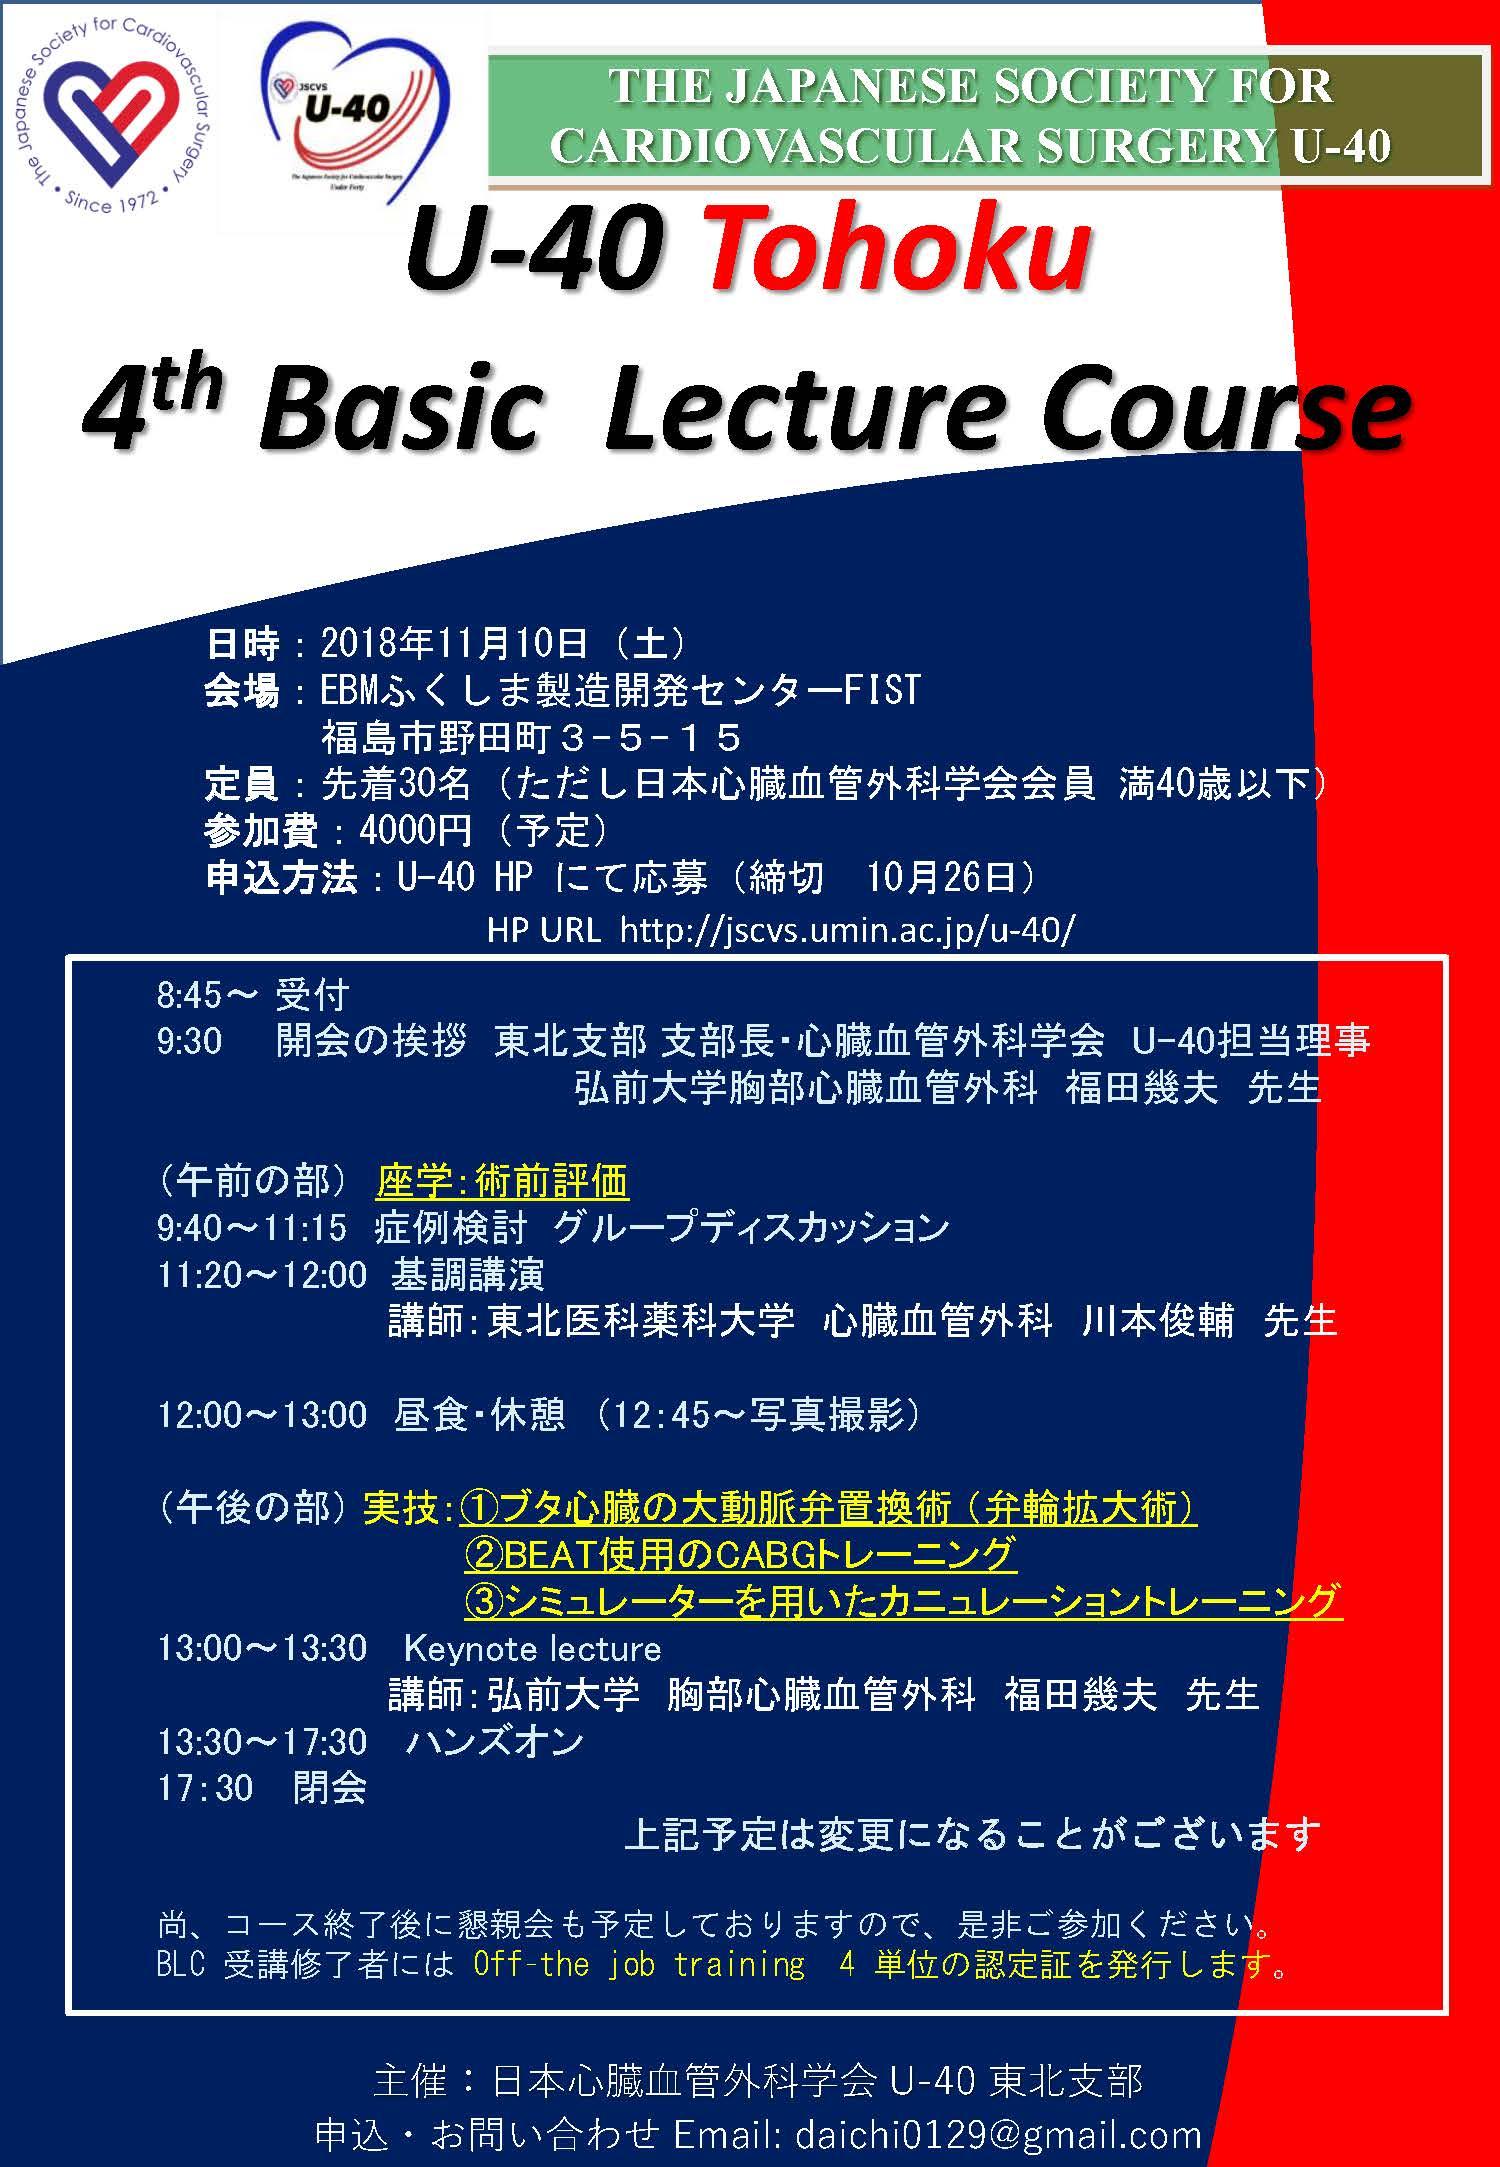 第4回 U-40東北支部 Basic Lecture Course